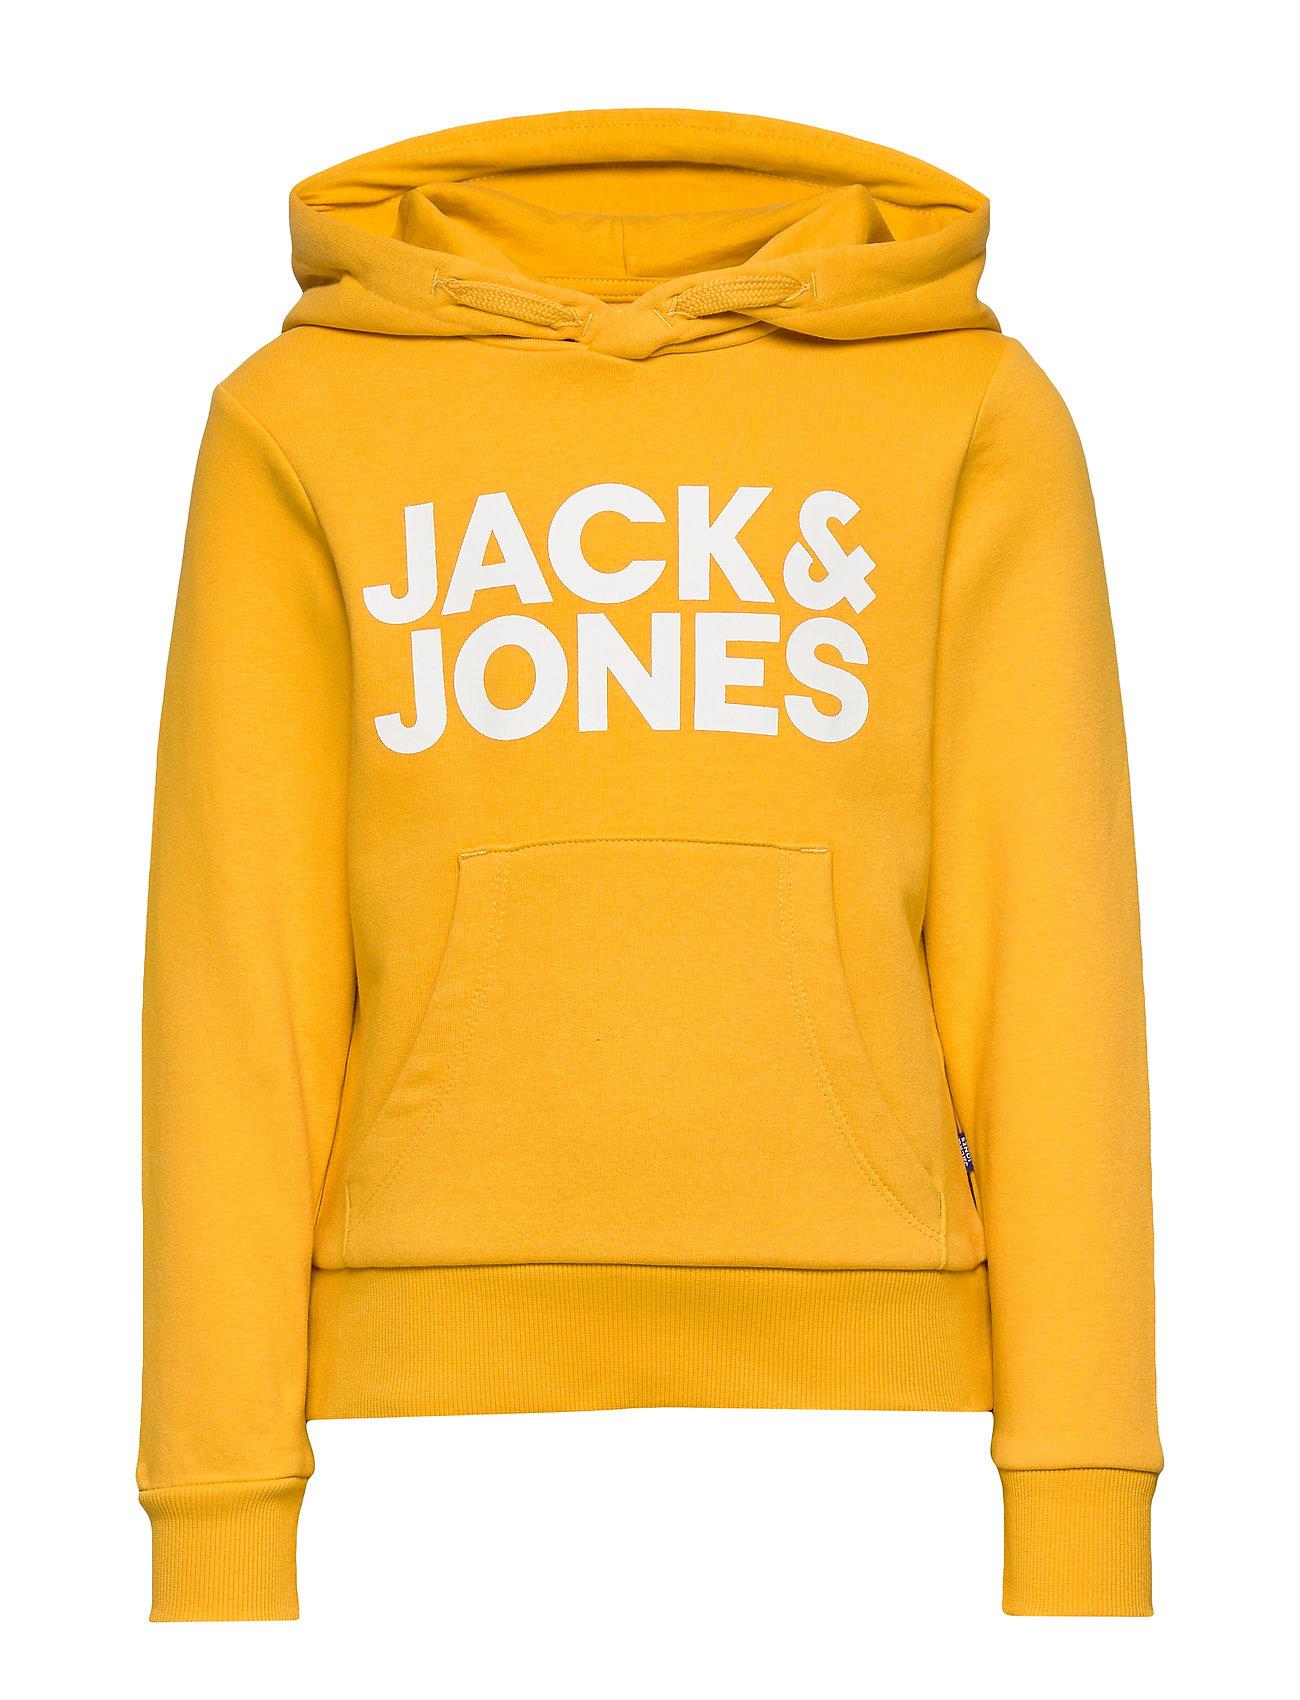 Jack & Jones JJECORP LOGO SWEAT HOOD  NOOS JR - YOLK YELLOW